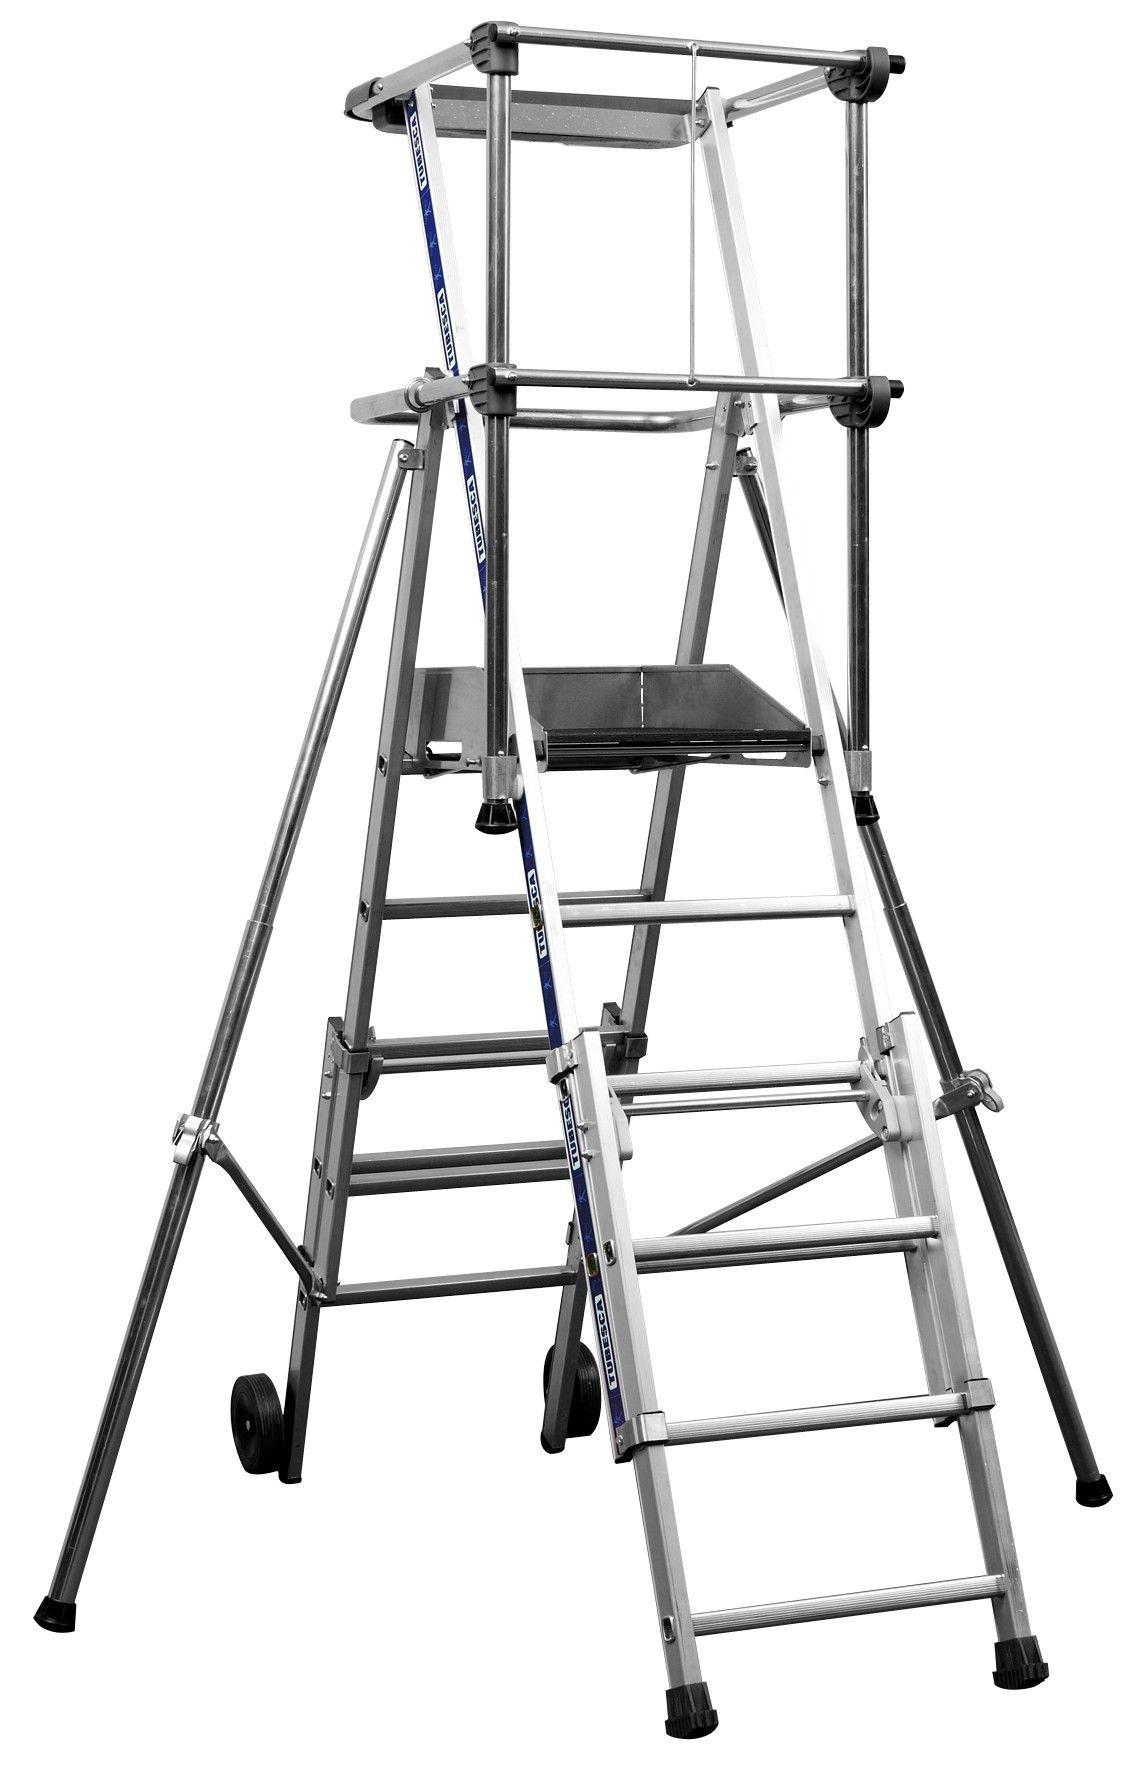 Tubesca ladder